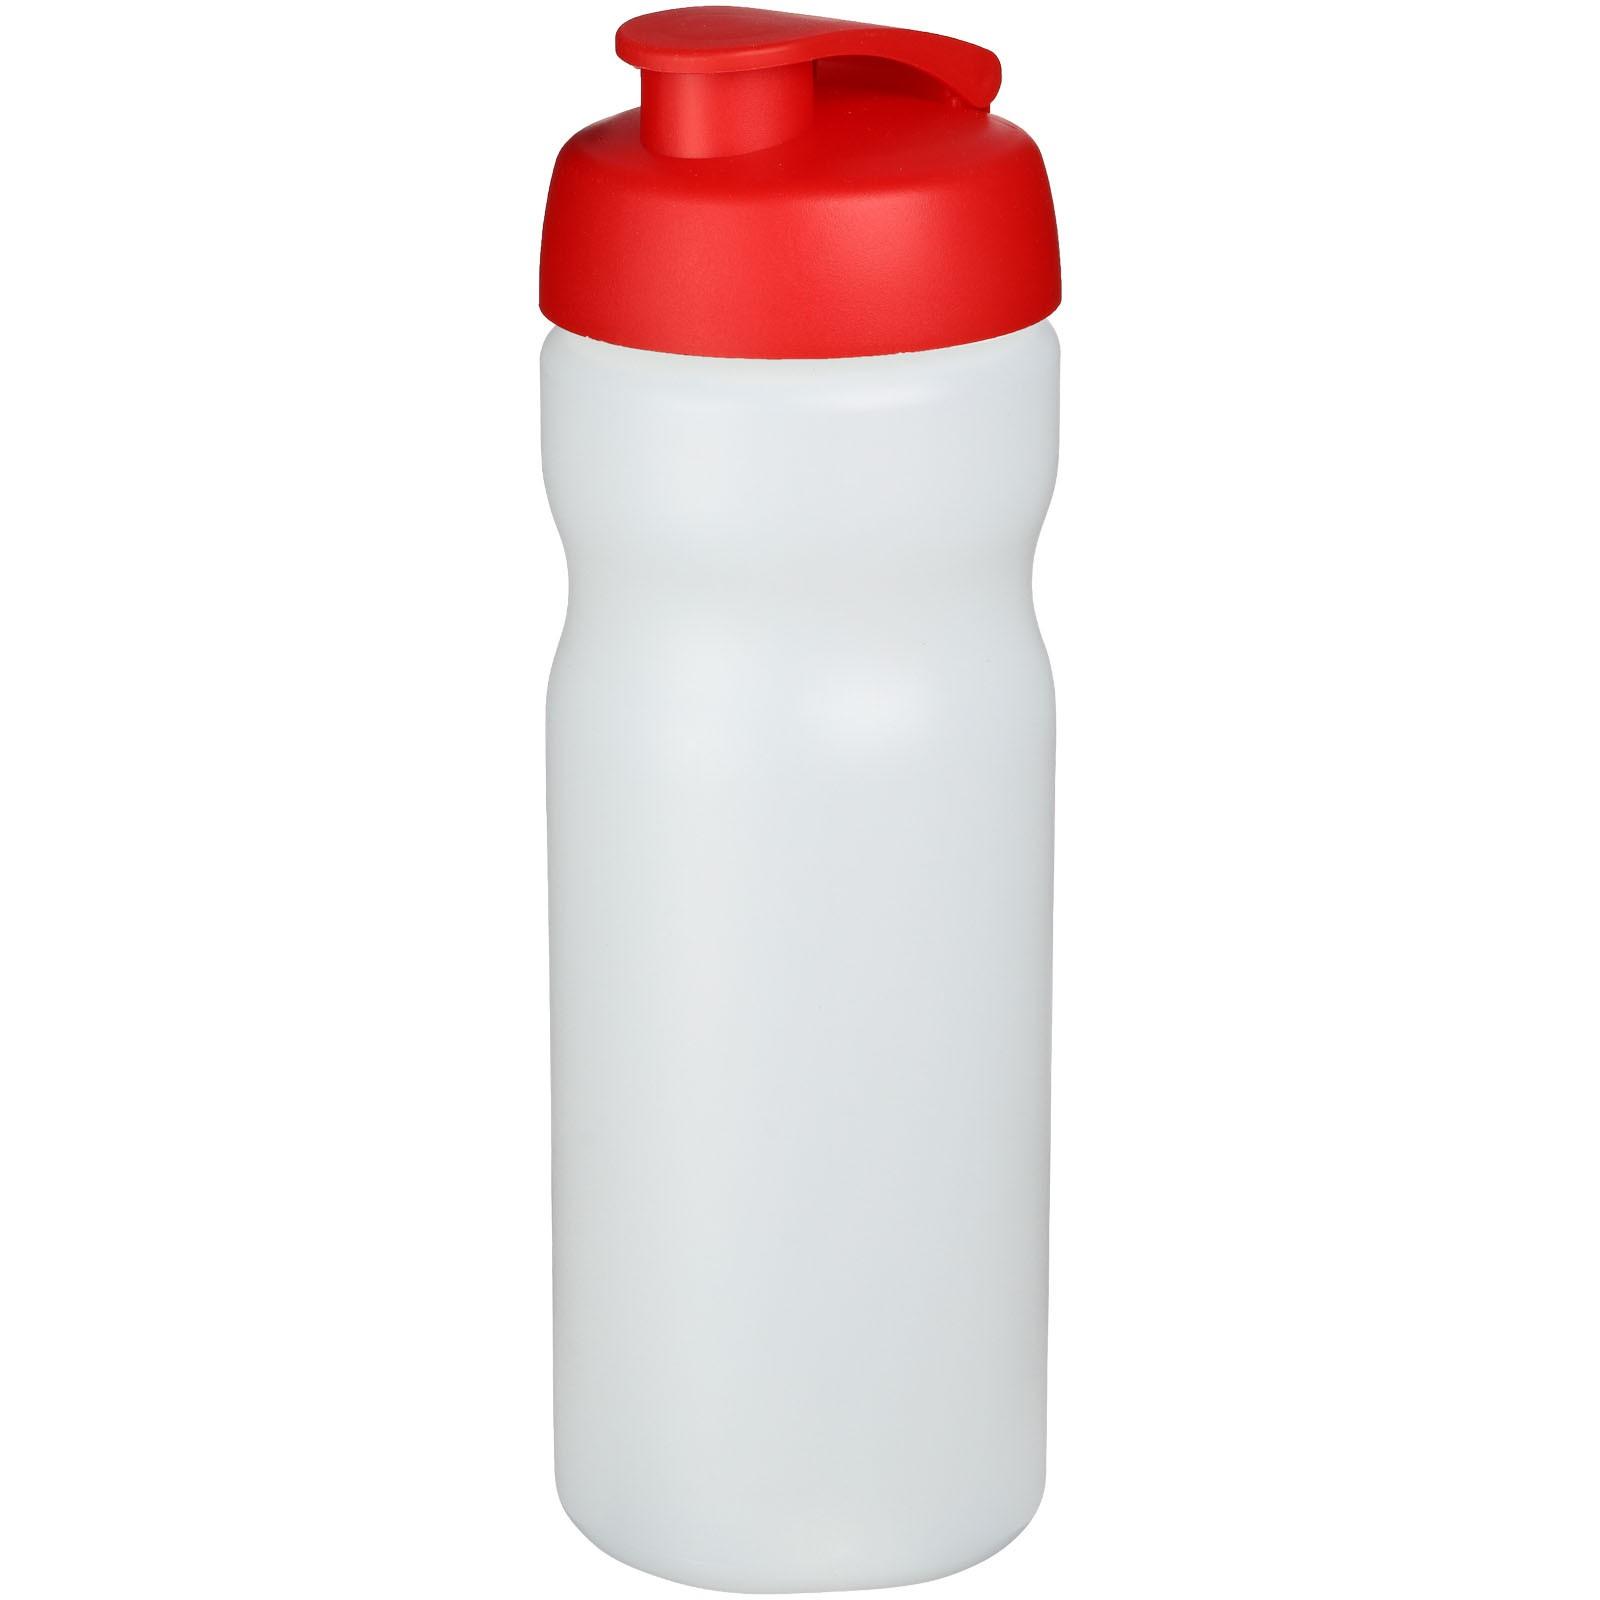 Baseline® Plus 650 ml flip lid sport bottle - Transparent / Red